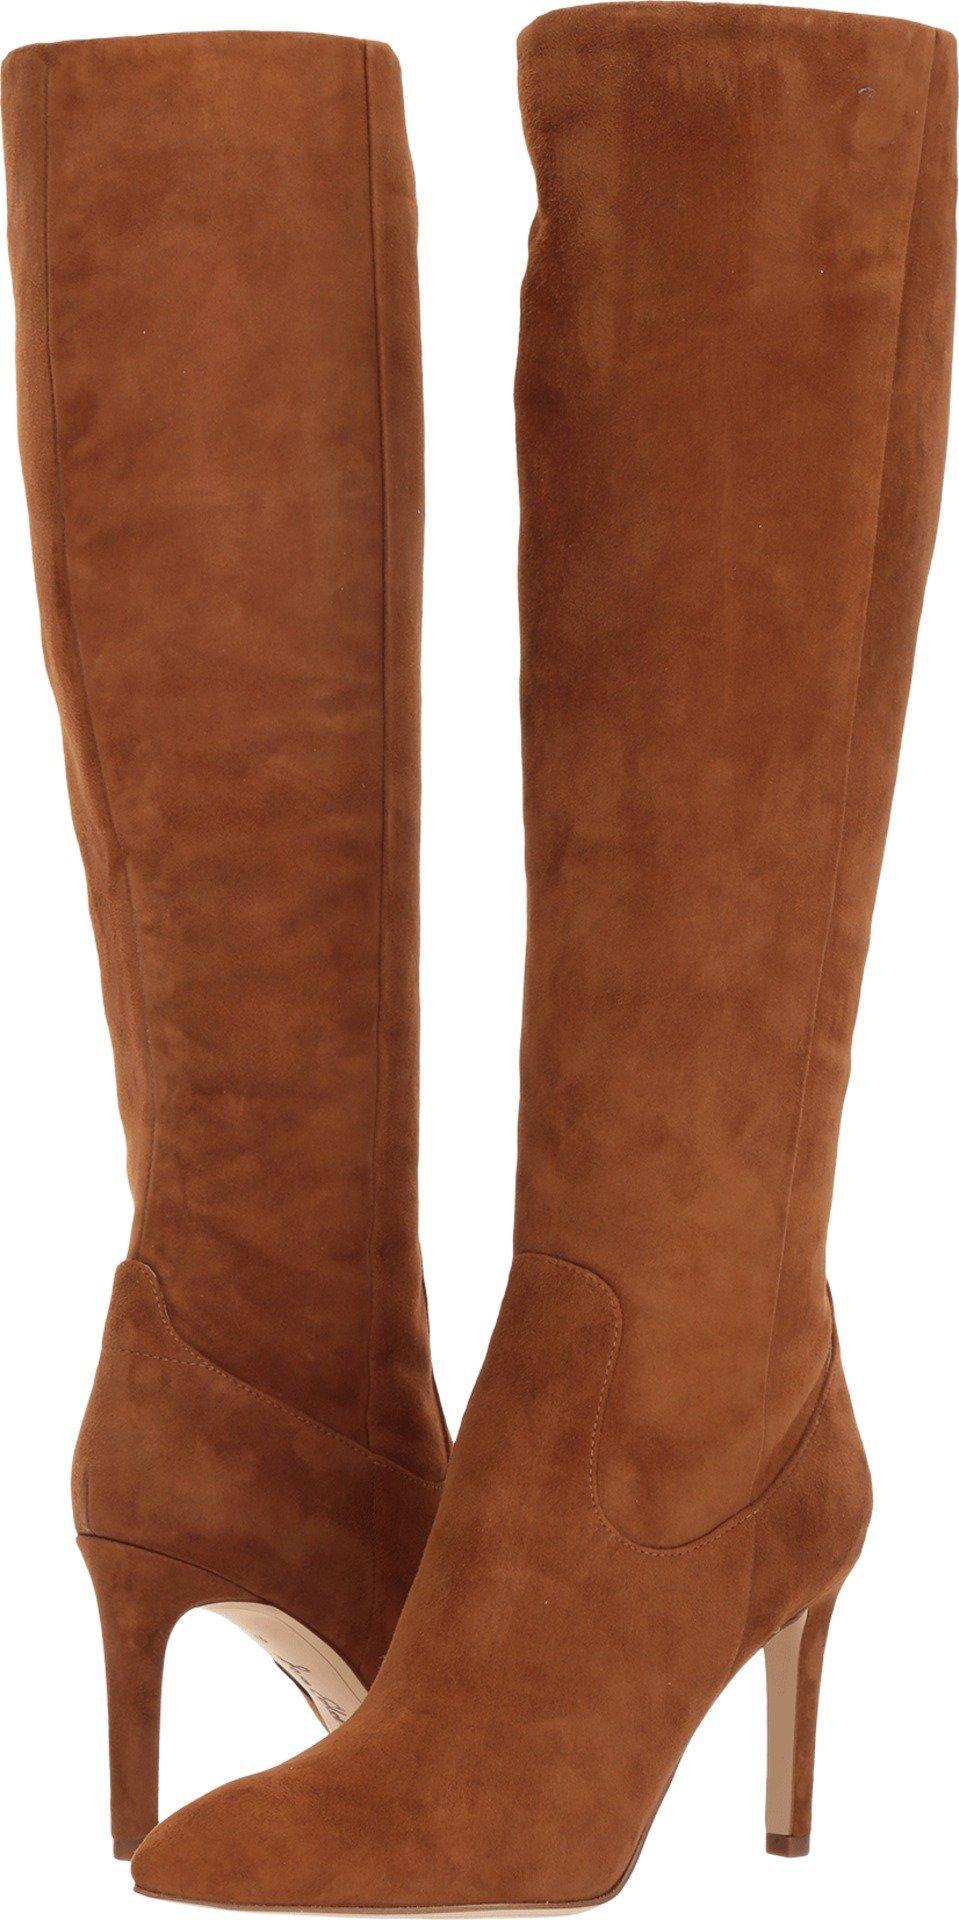 Sam Edelman Women's Olencia Knee High Boot, Luggage Suede, 9 Medium US